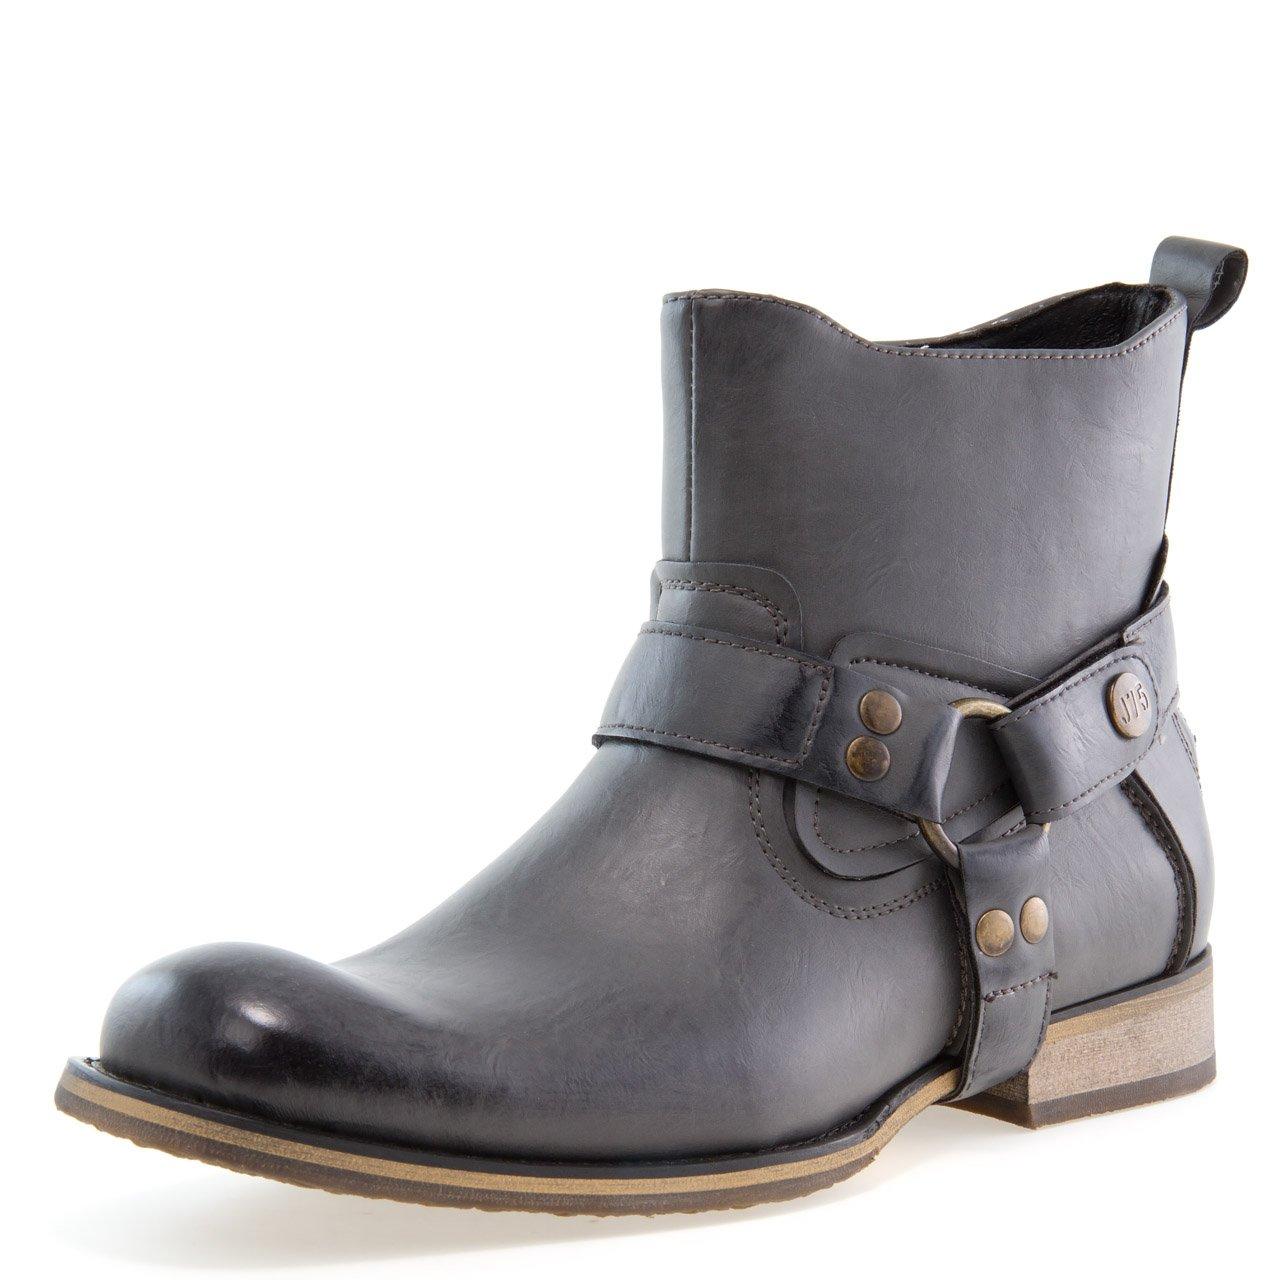 Jump J75 Men's Wild X Western Boot Coal 13 D US